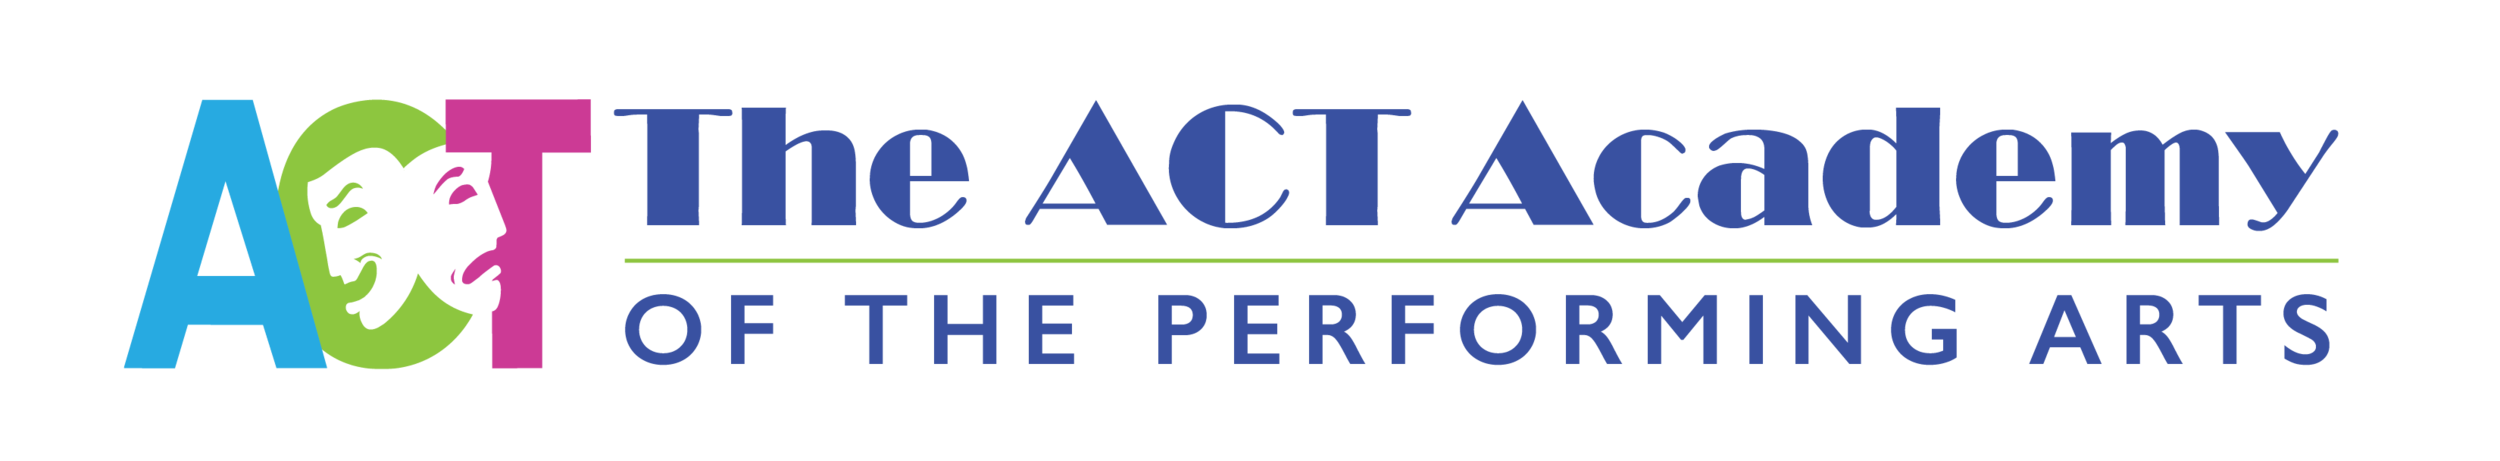 TheActAcademyHeader2018.png